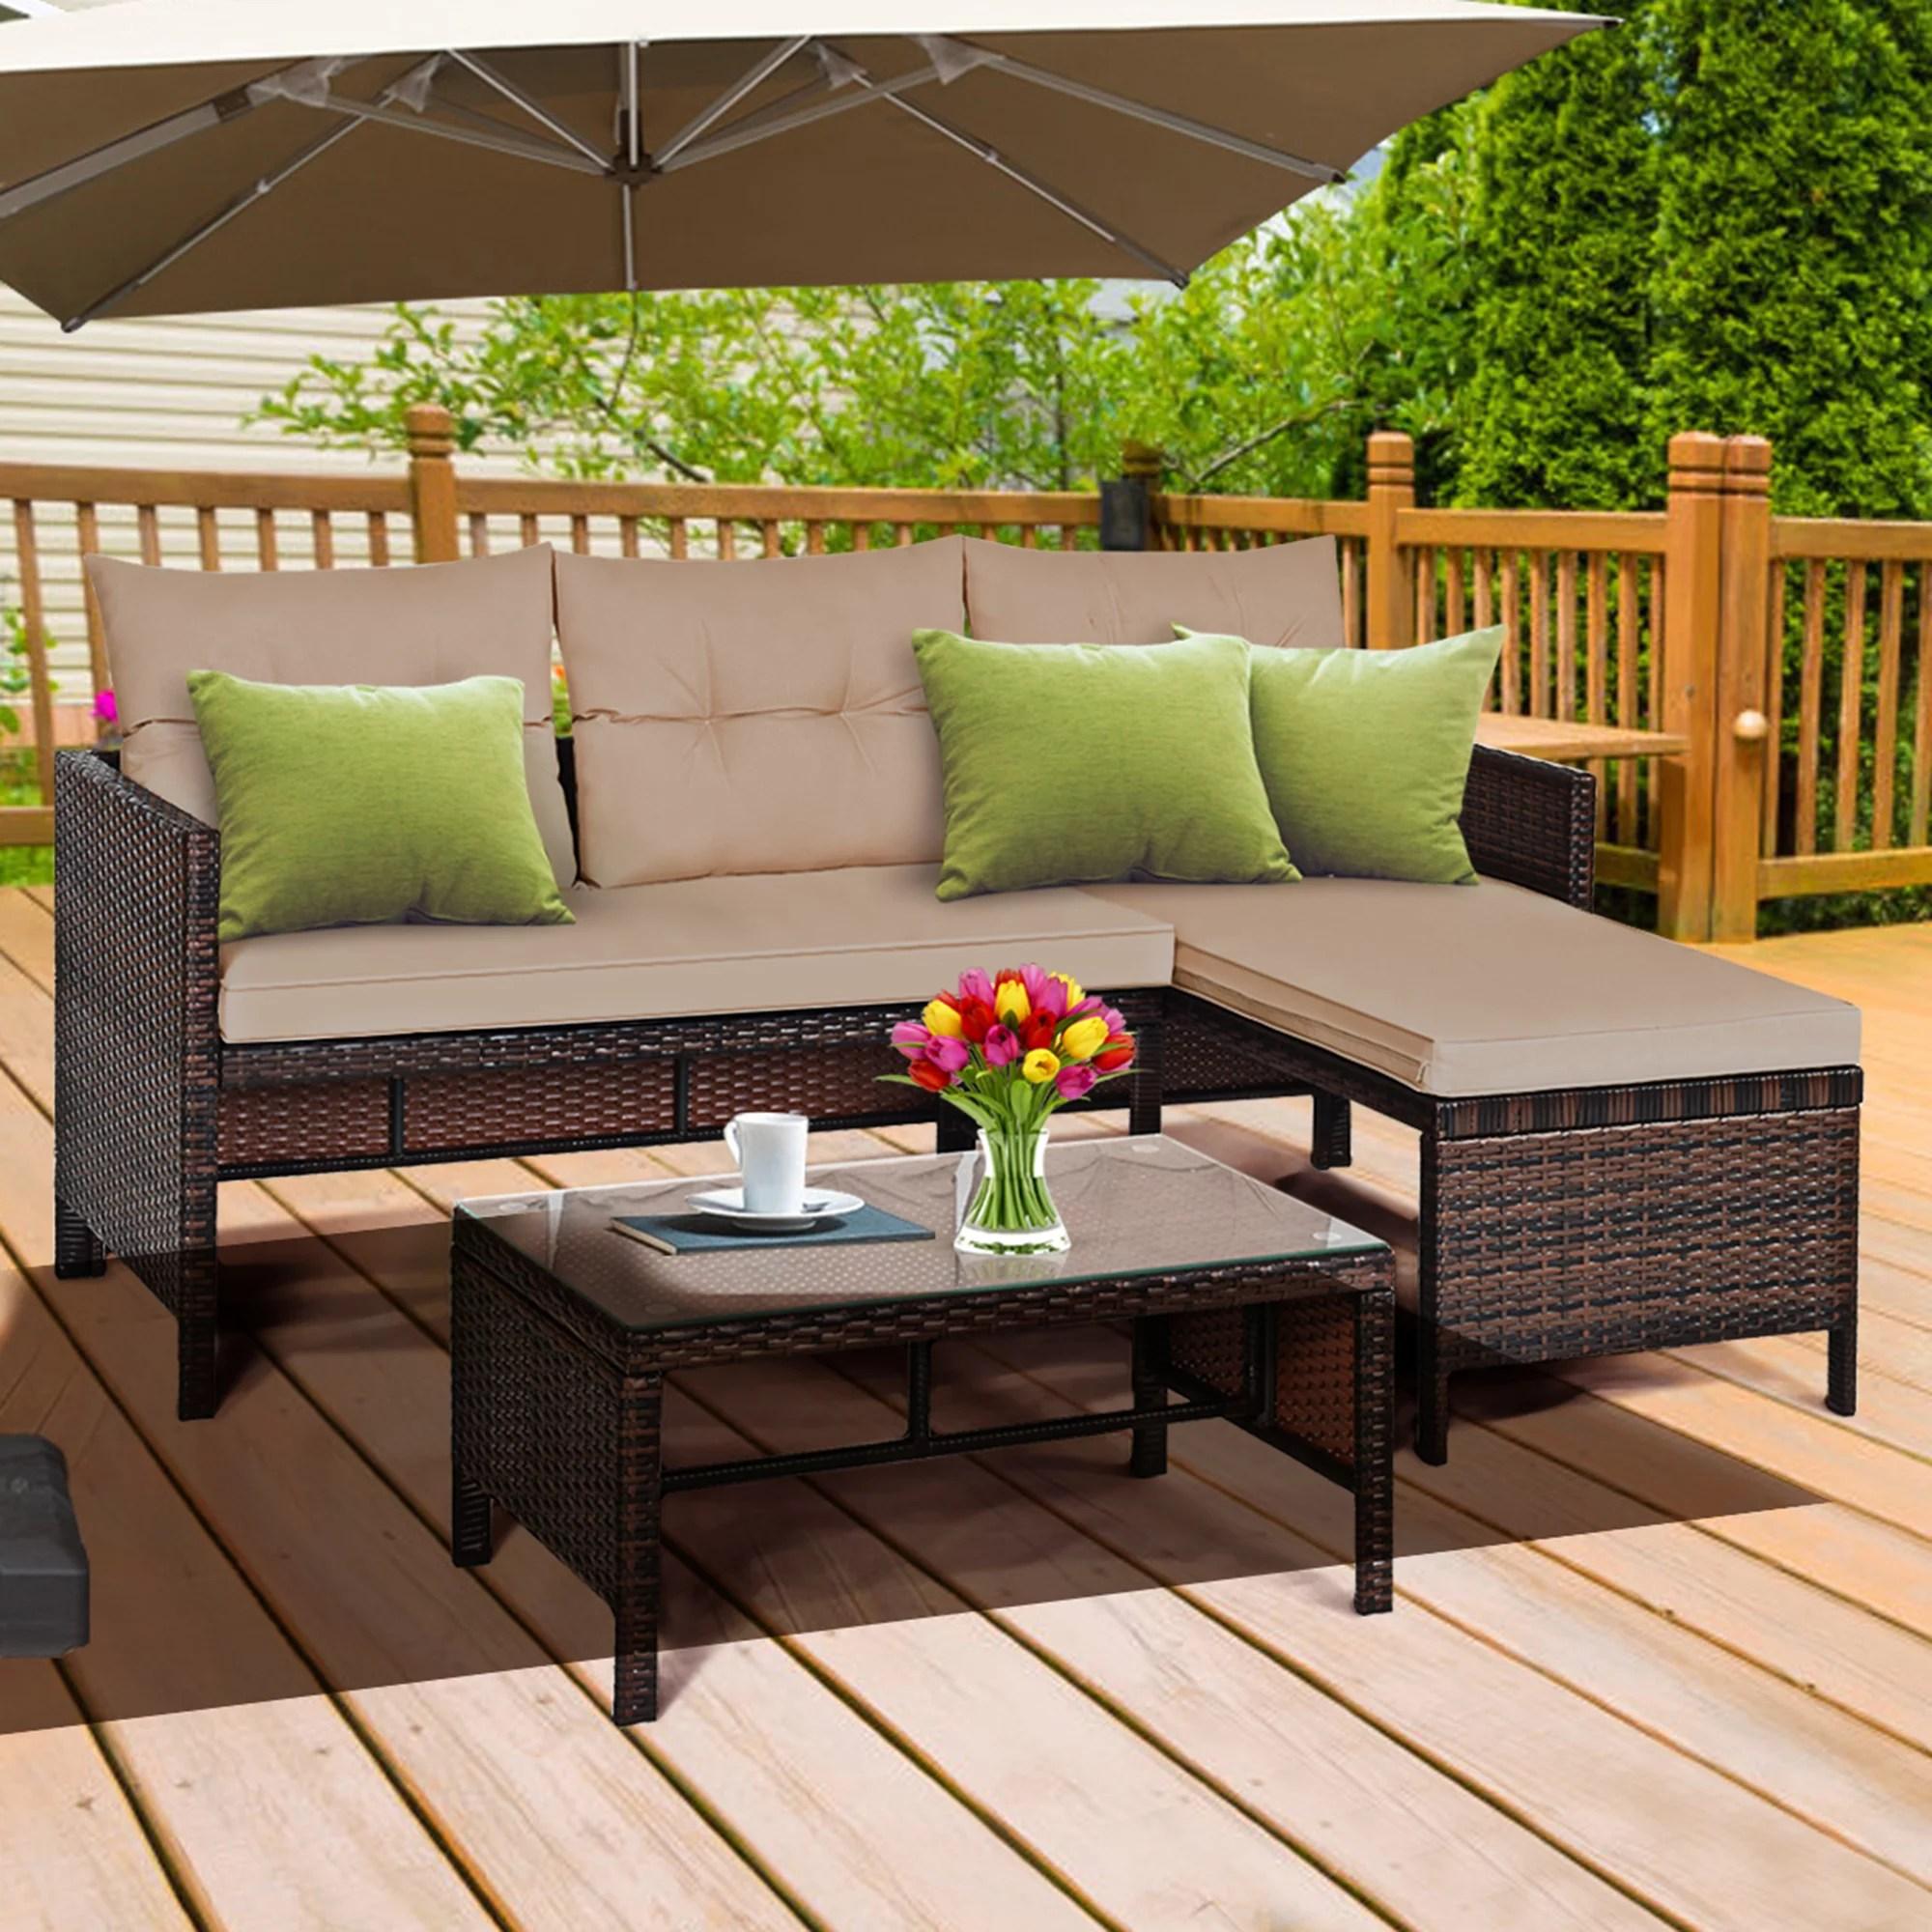 gymax 3pc rattan furniture set outdoor patio couch sofa wicker set walmart com